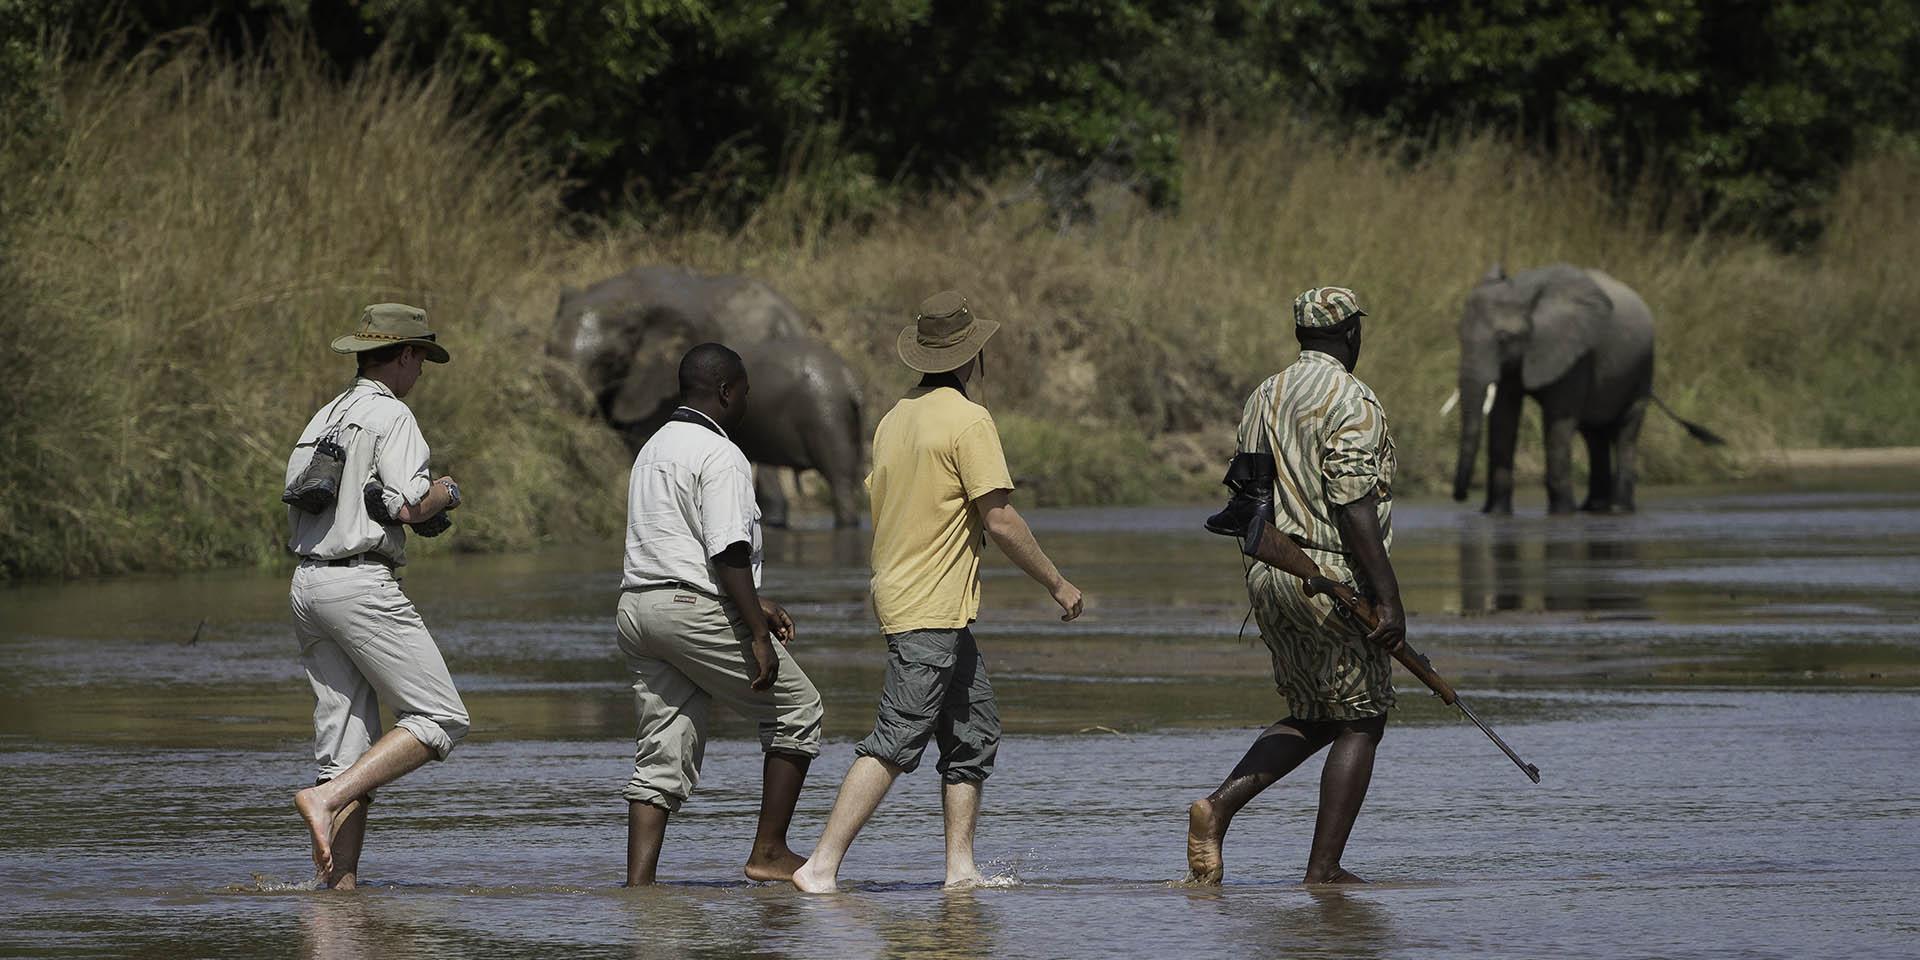 tailor made tours-safaris-malawian-style-malawi-adventures-experiences-holidays-specialist-tour-operator-malawi-adventure-kuyenda-elephants-guided-walk